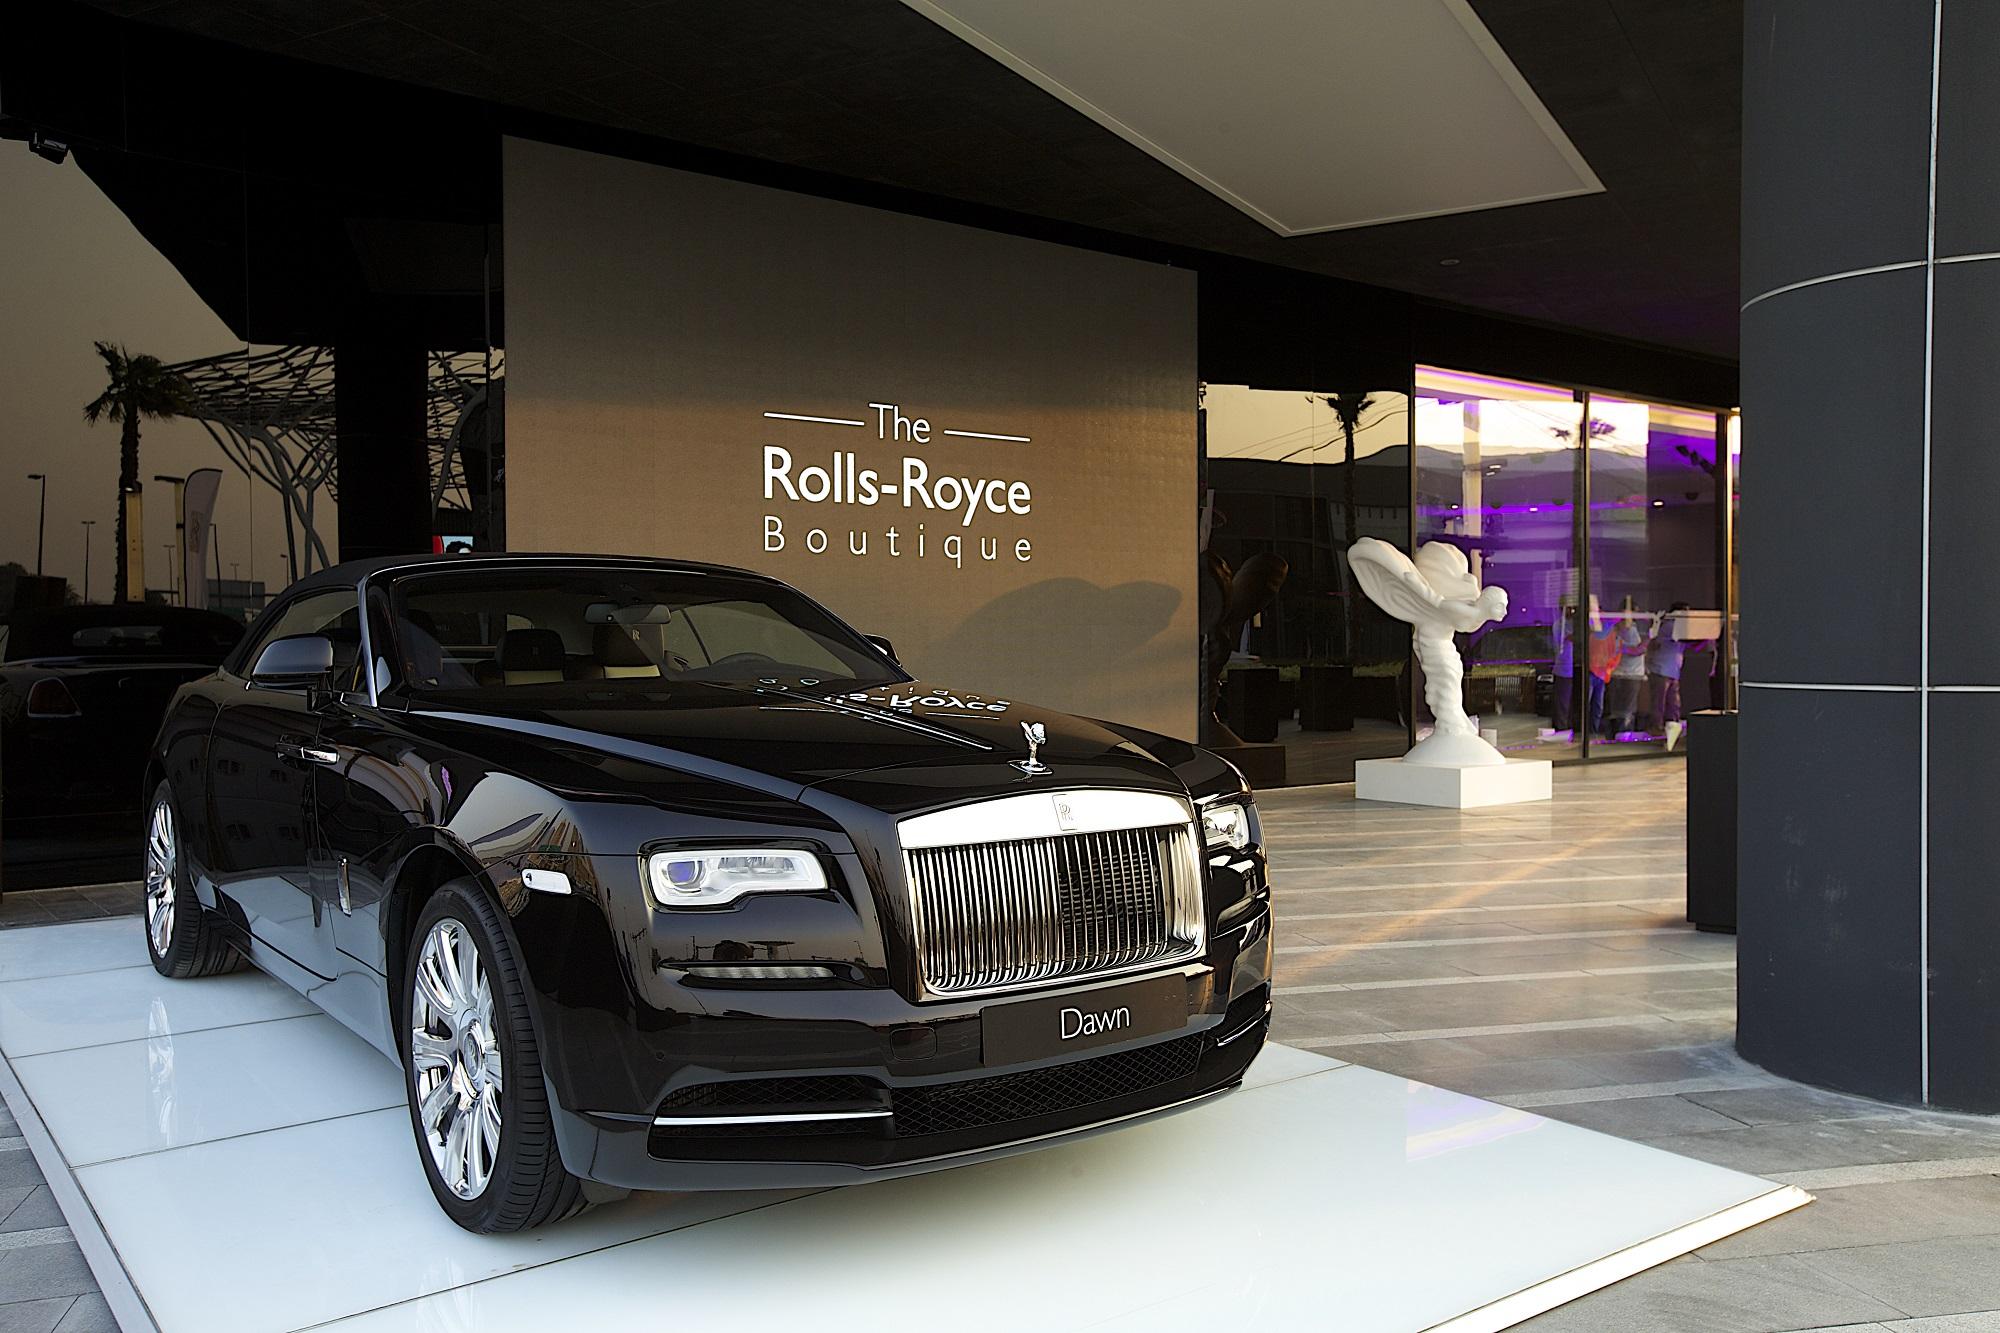 Rolls Royce Dealers >> Agmc Highest Selling Rolls Royce Dealership Globally Tires